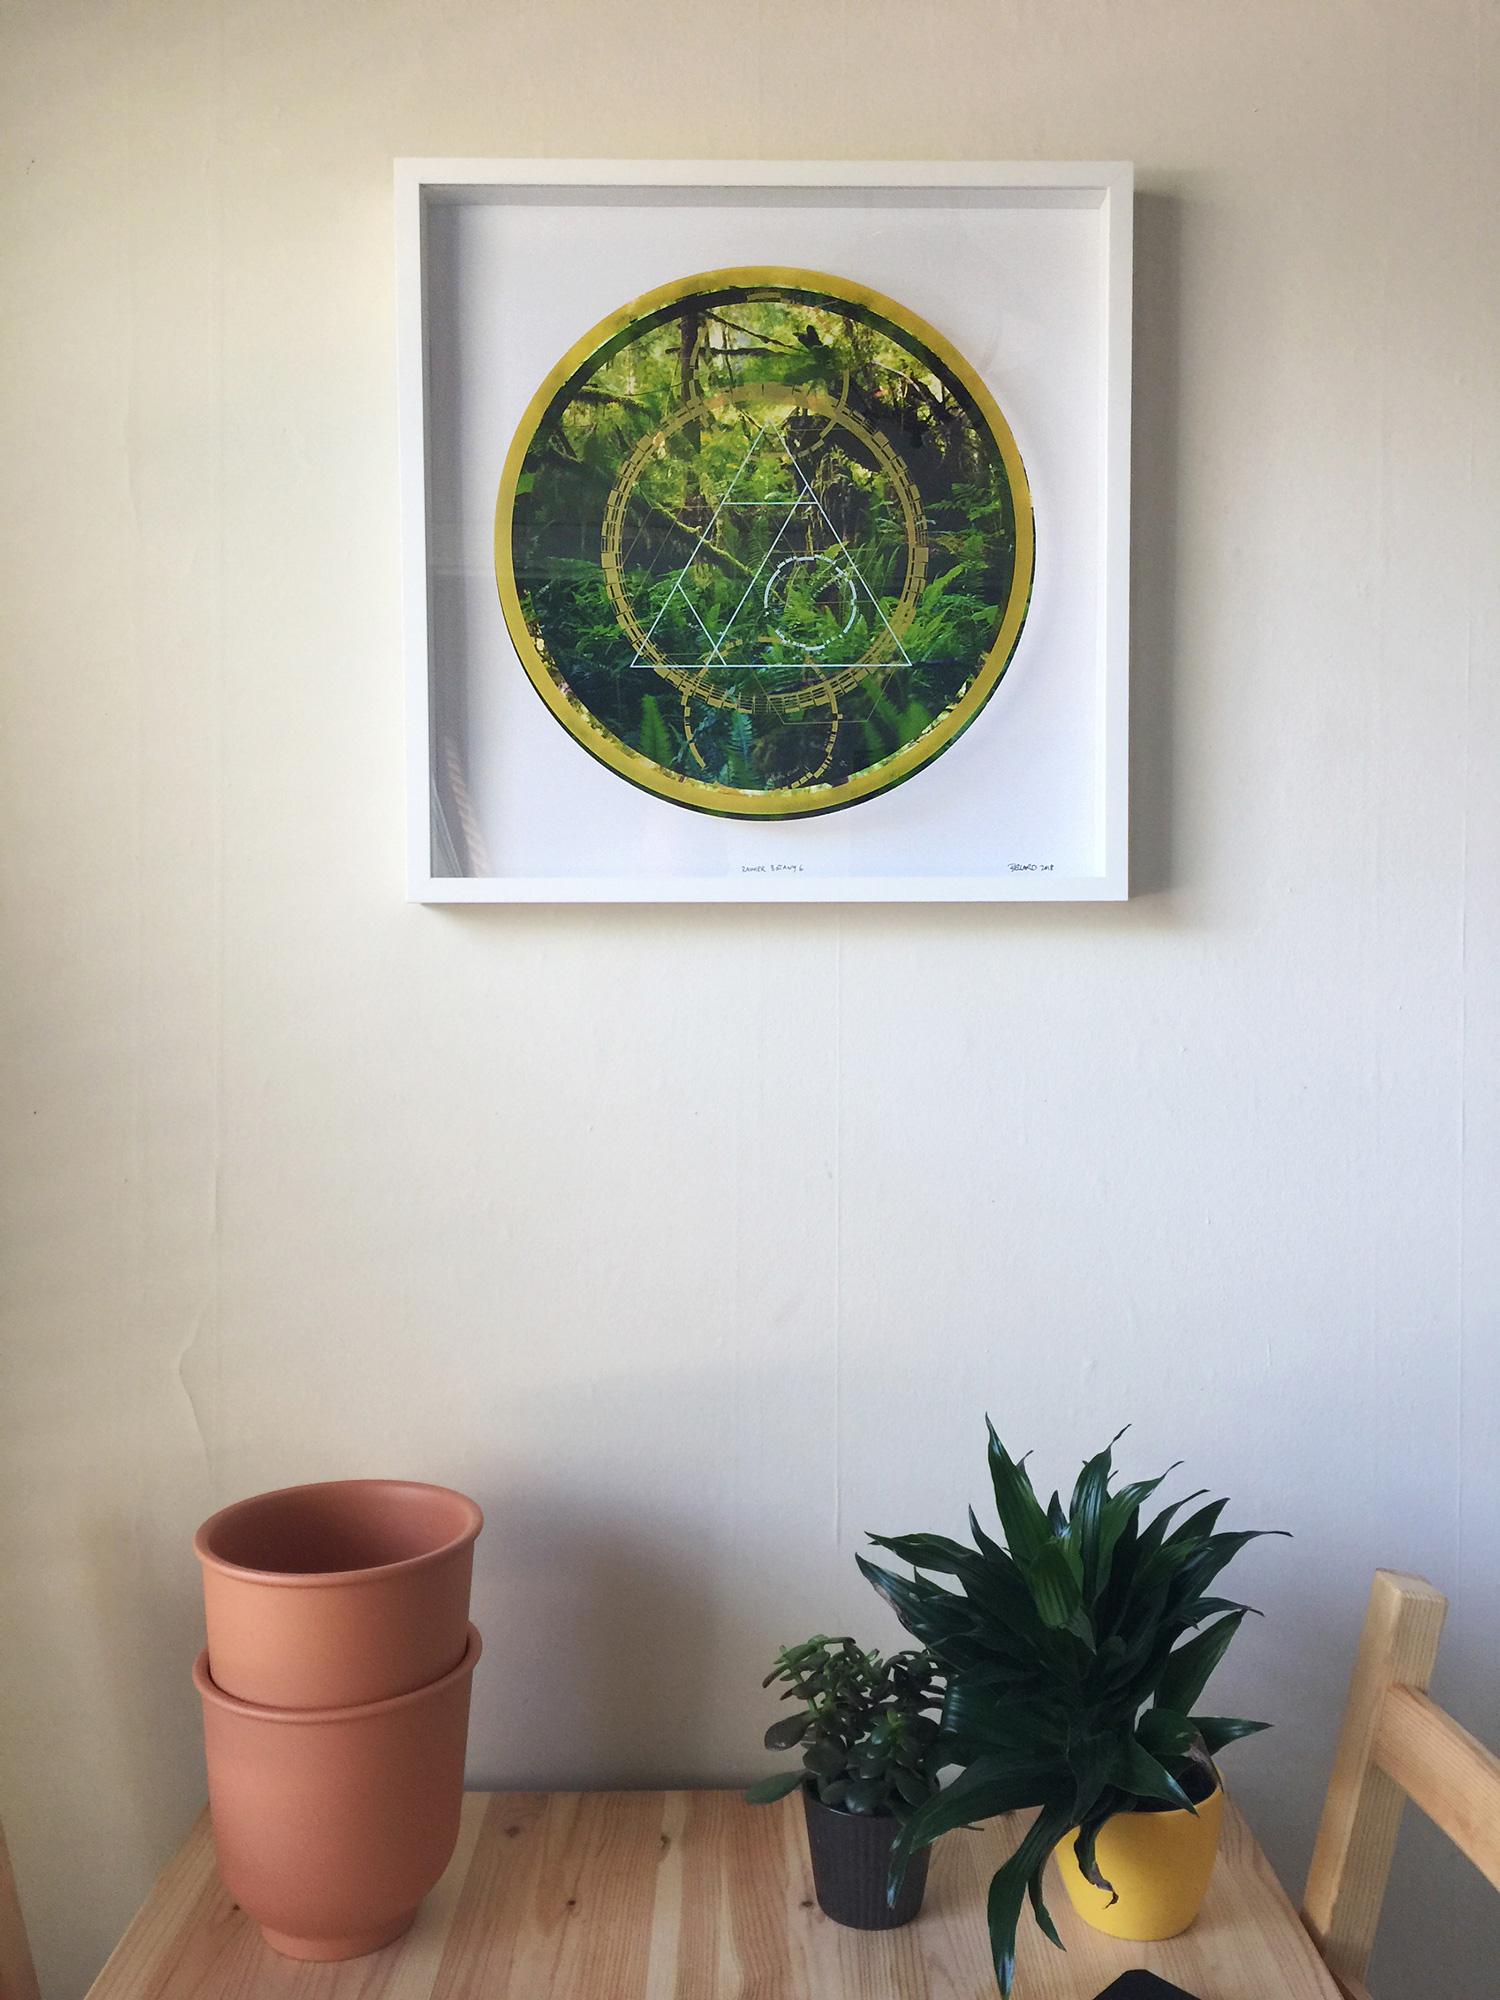 Rainier-Botany-6-on-wall.jpg